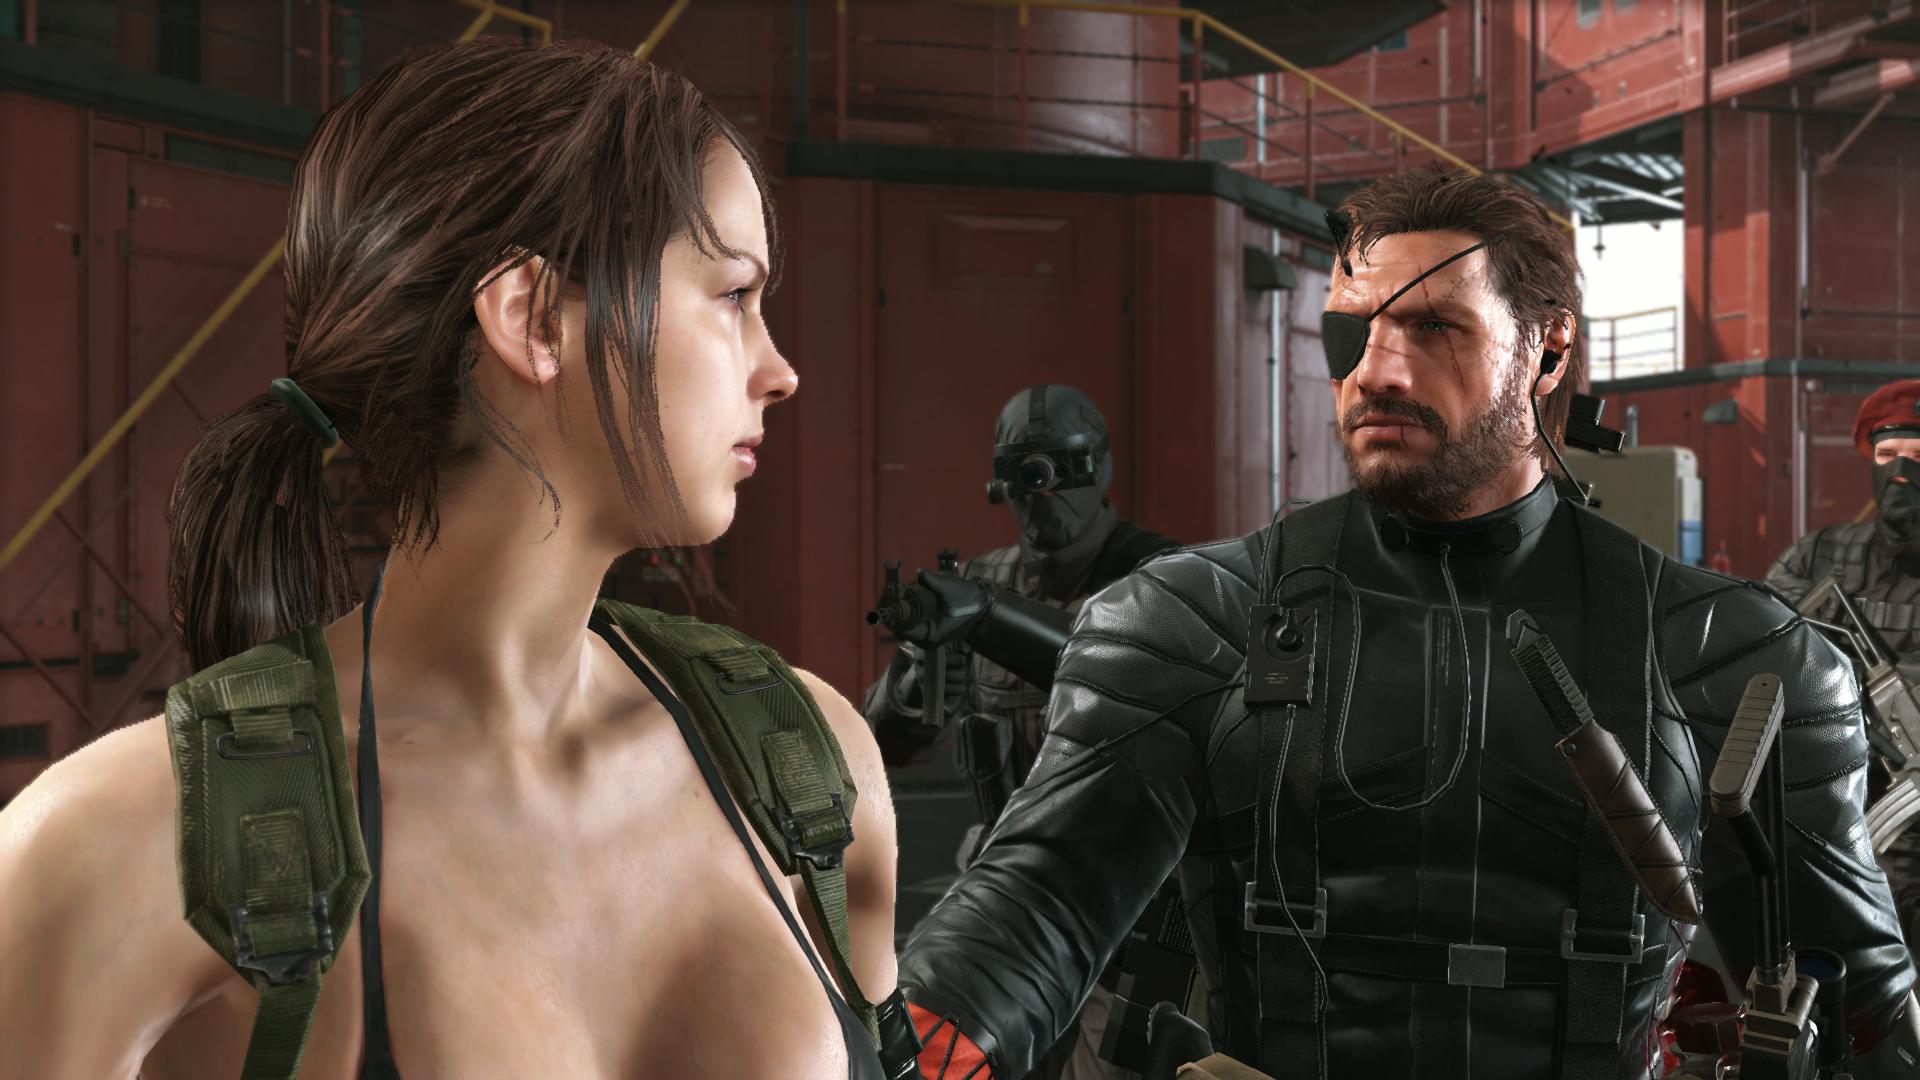 mgsvtpp_2017_07_23_01_08_11_123.png - Metal Gear Solid 5: The Phantom Pain